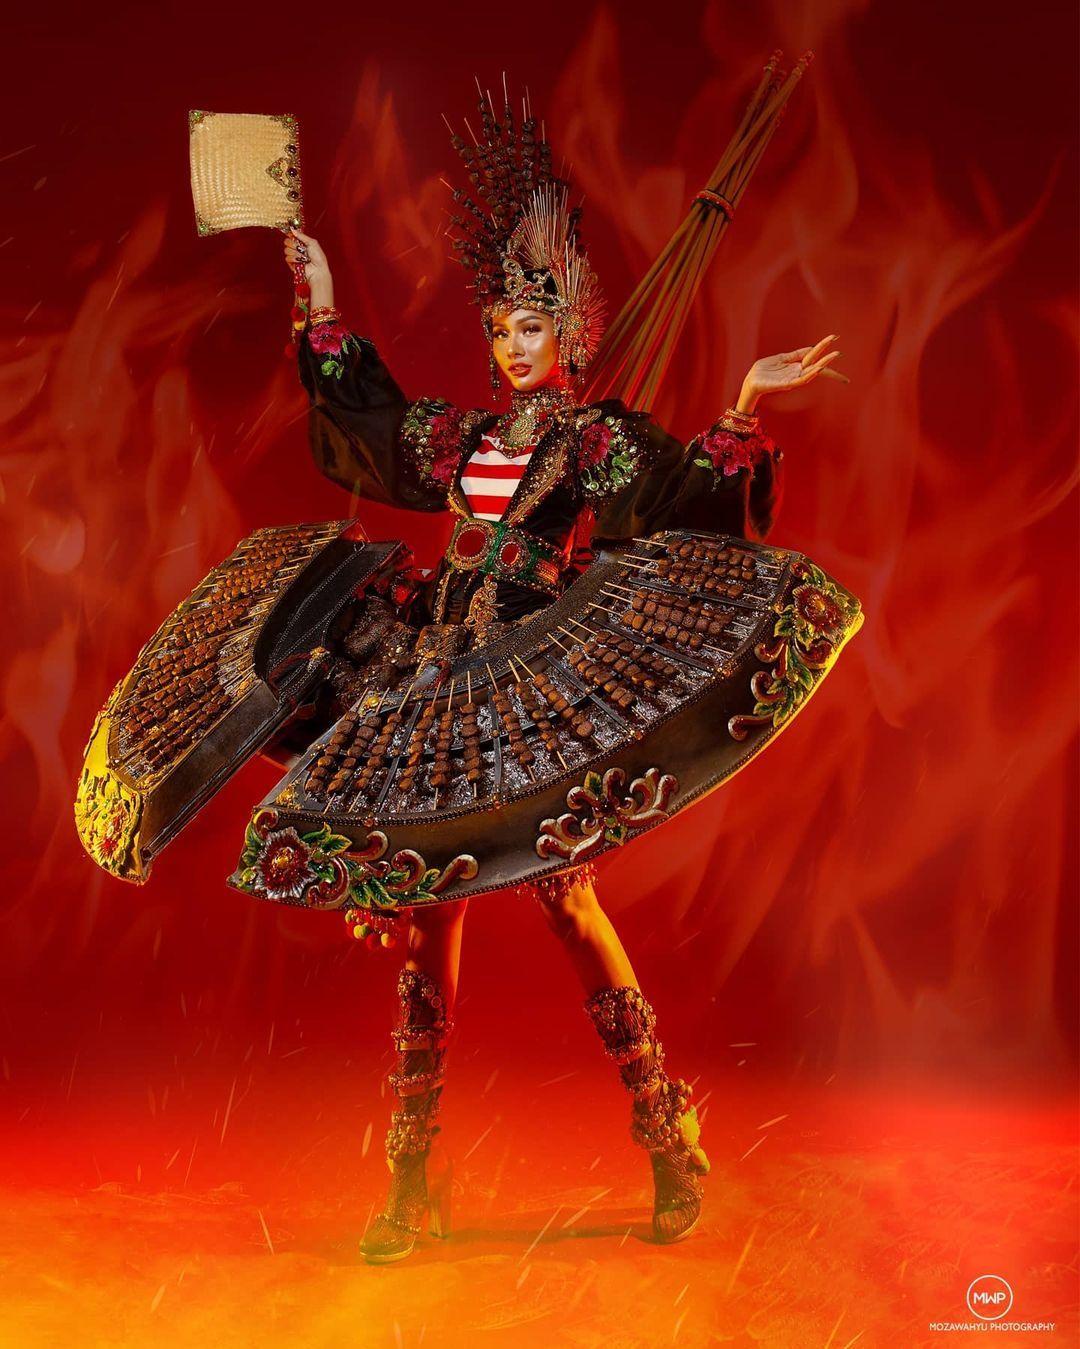 Miss Grand Indonesia 2020 Aurra Kharisma